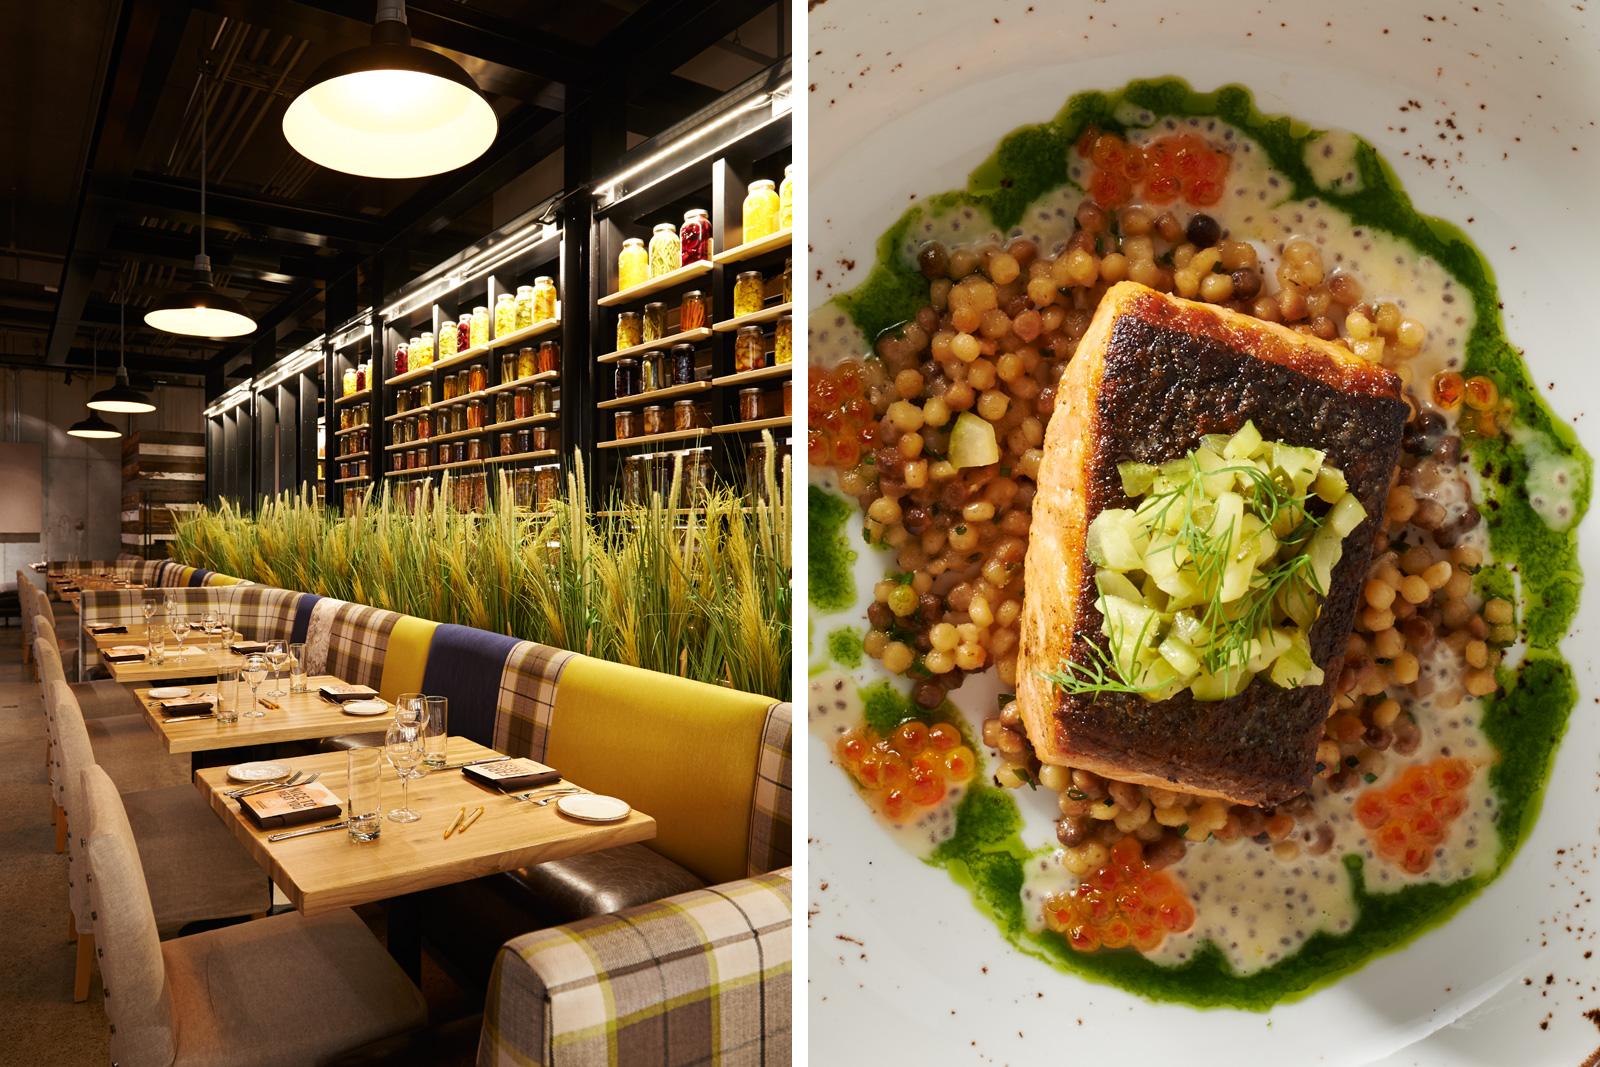 Interiors and Seafood dish at Urban Farmer CLE